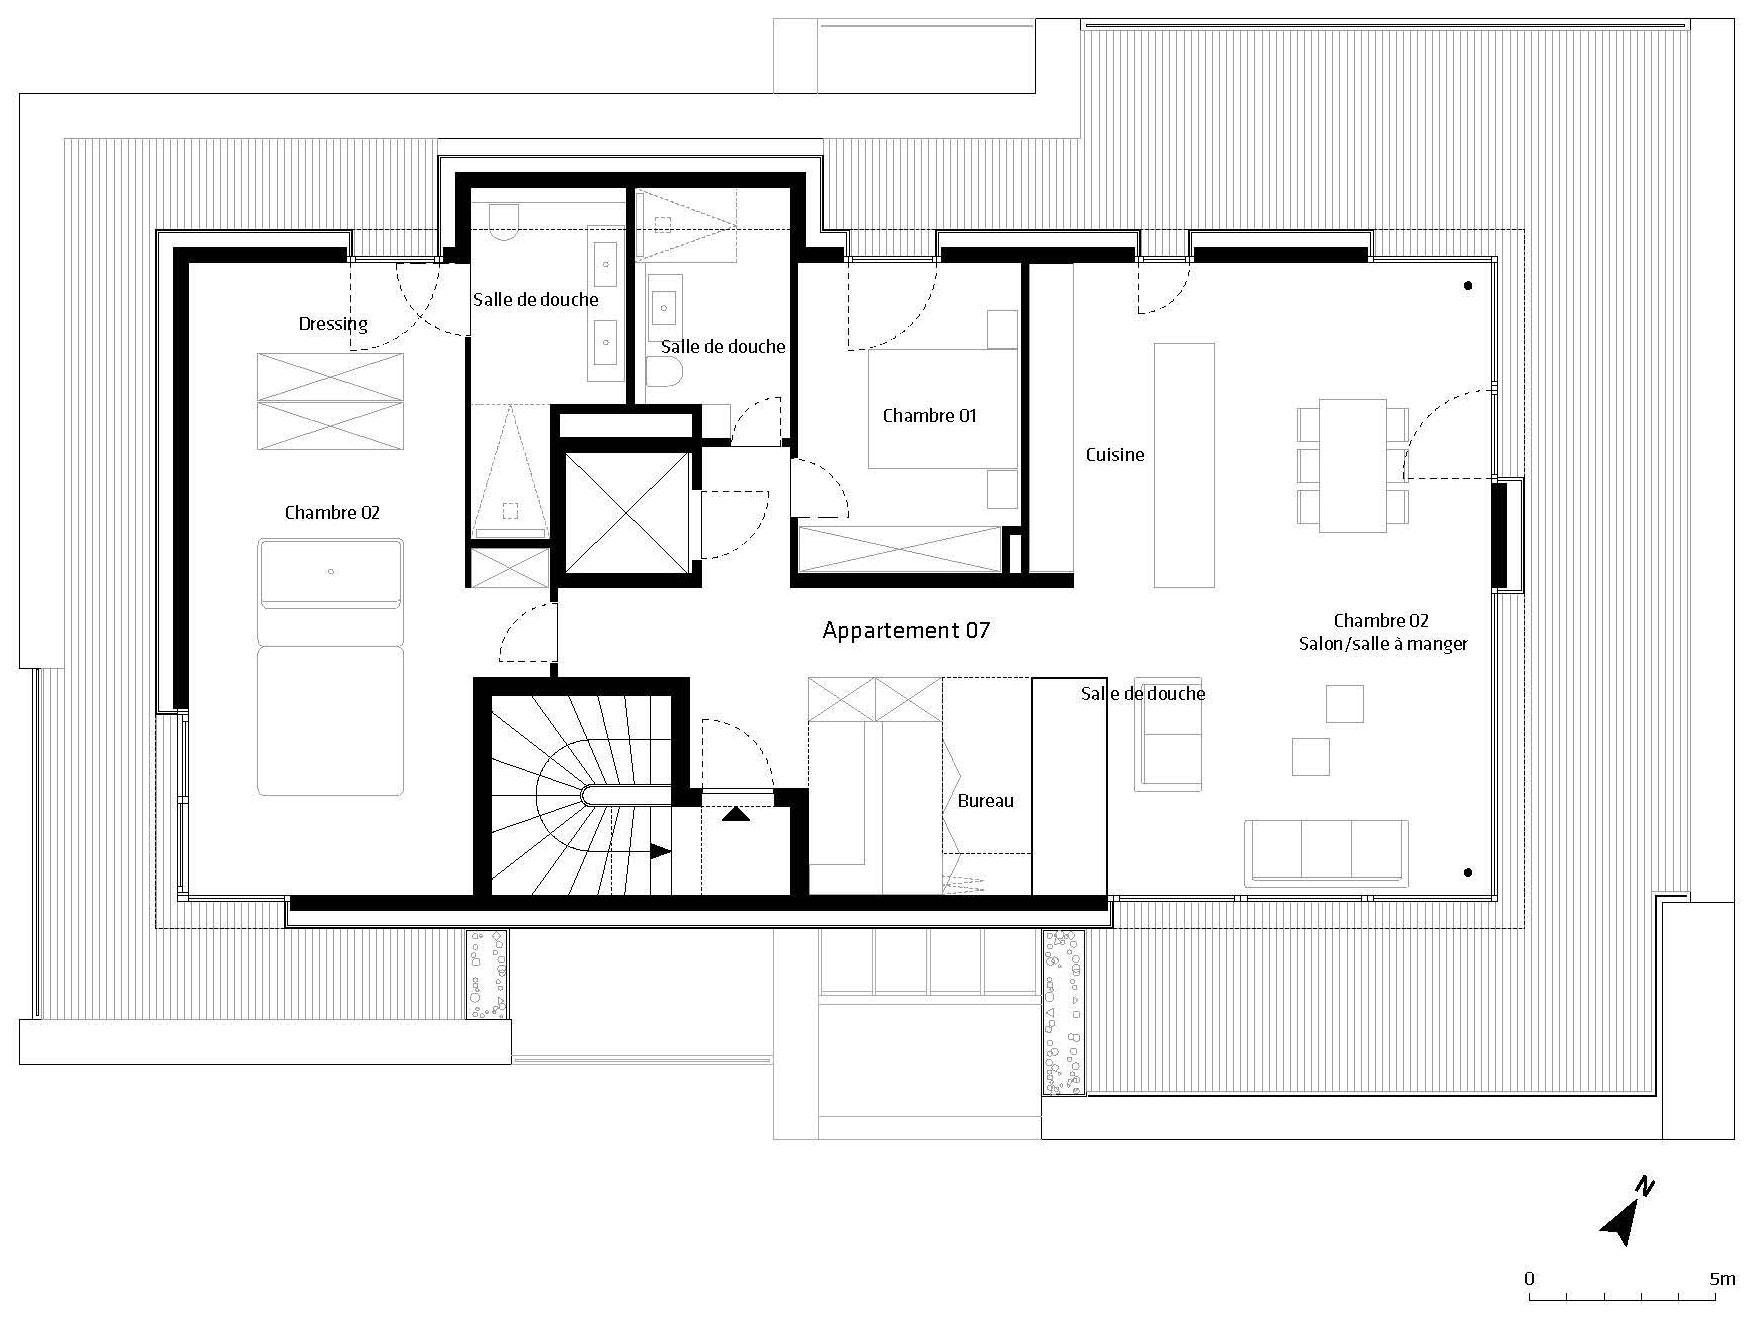 Housing-Building-14